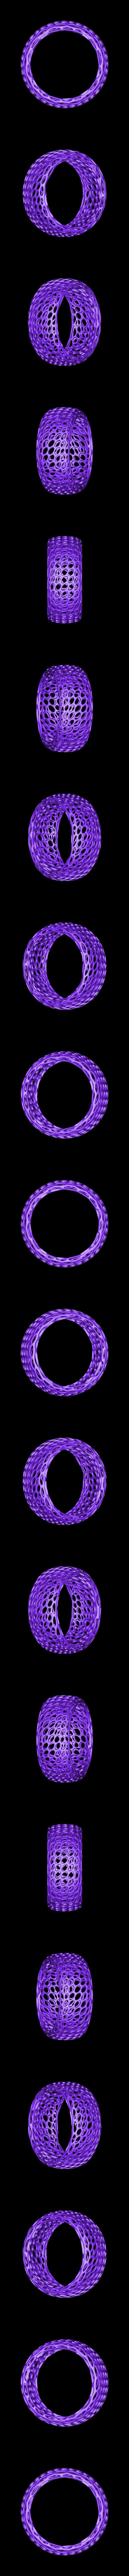 convexBracelet_-_Voronoi_C.stl Download free STL file Bracelet - Voronoi Style • 3D print model, Numbmond